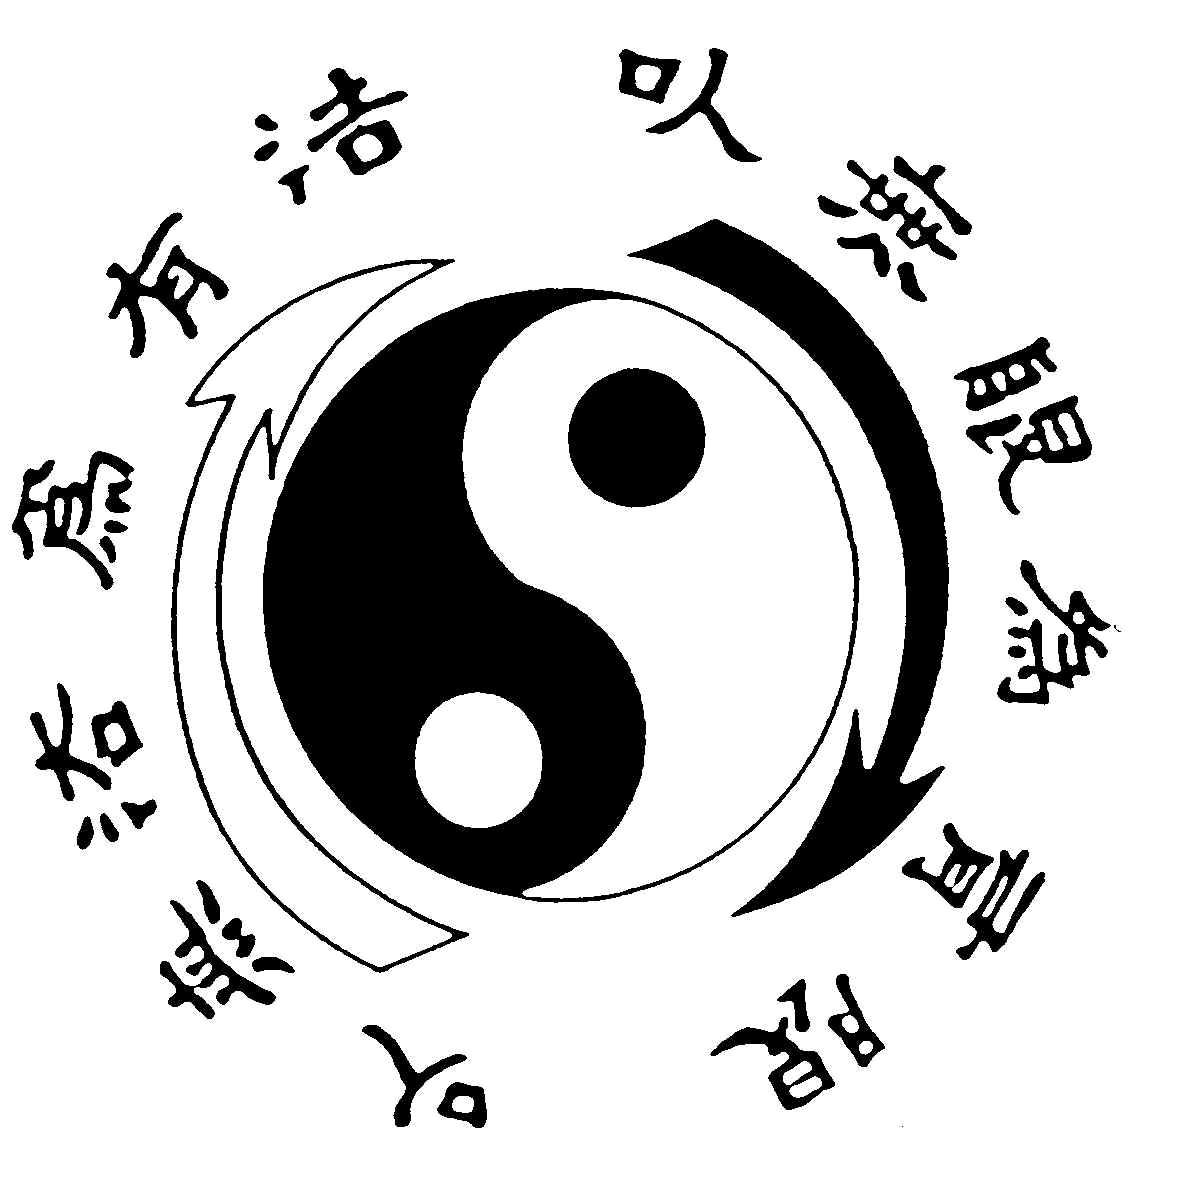 Jeet Kune Do.